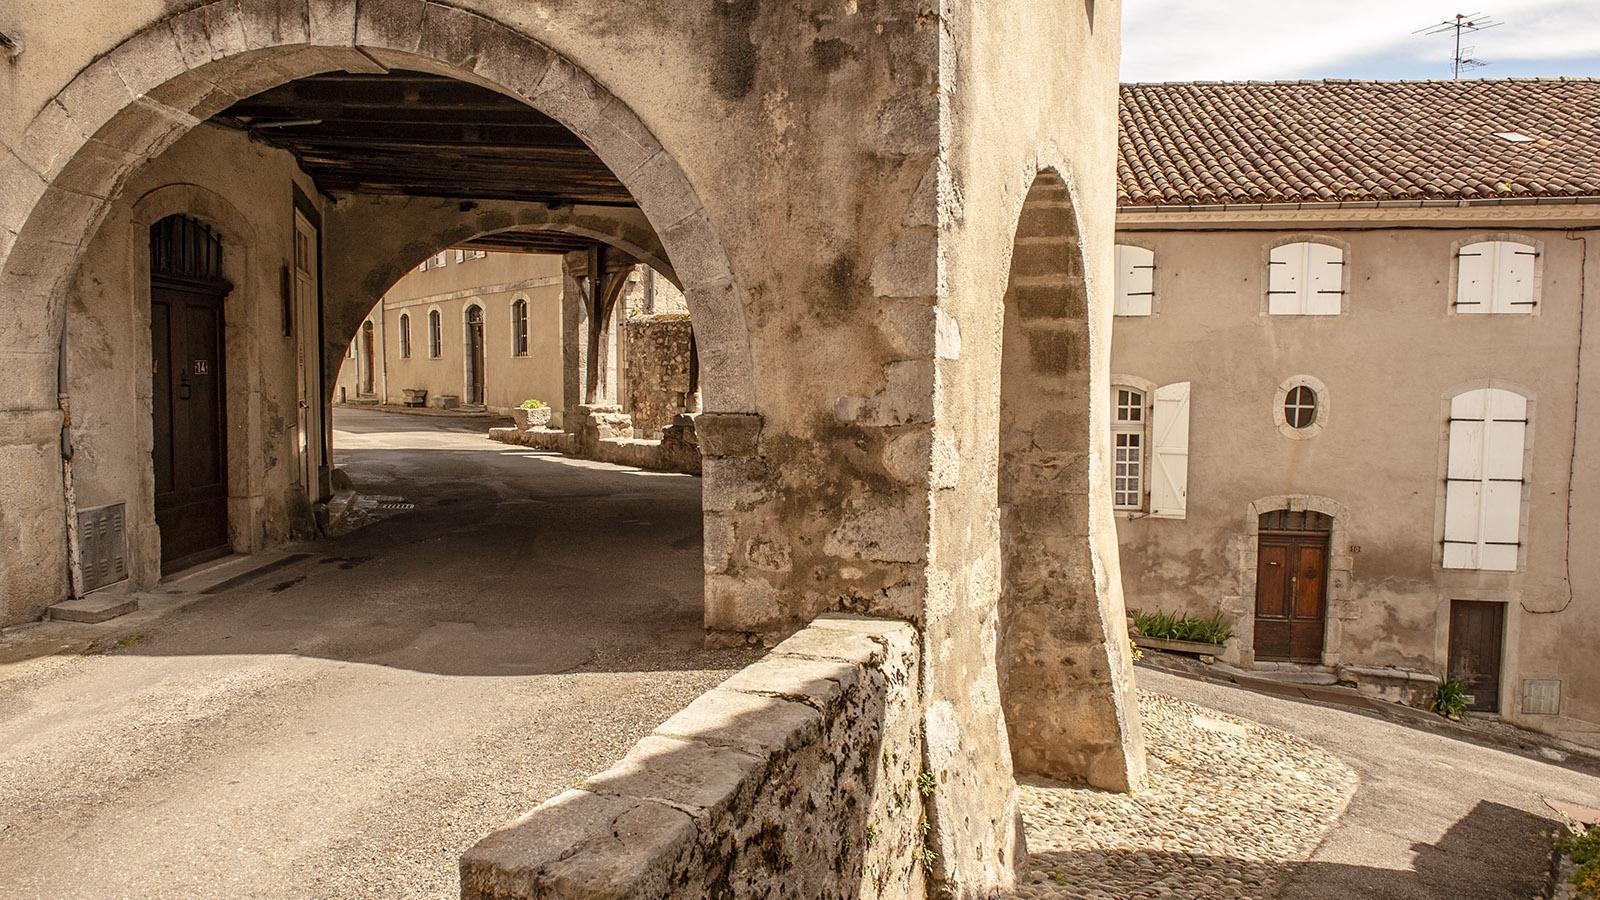 Saint-Lizier: in der Altstadt. Foto: Hilke Maunder